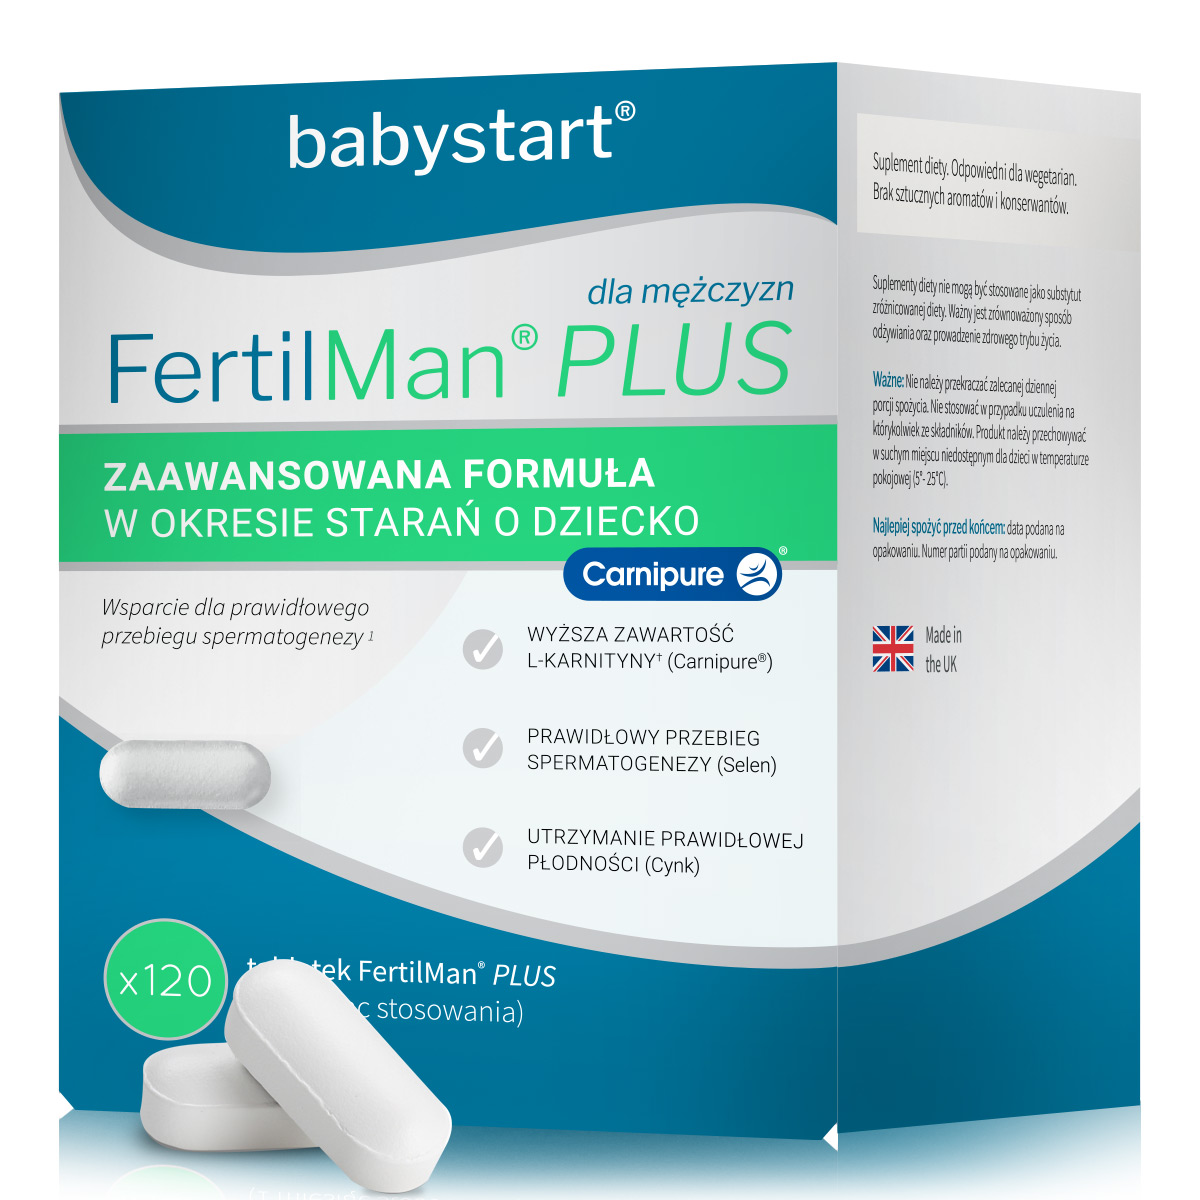 FertilMan Plus